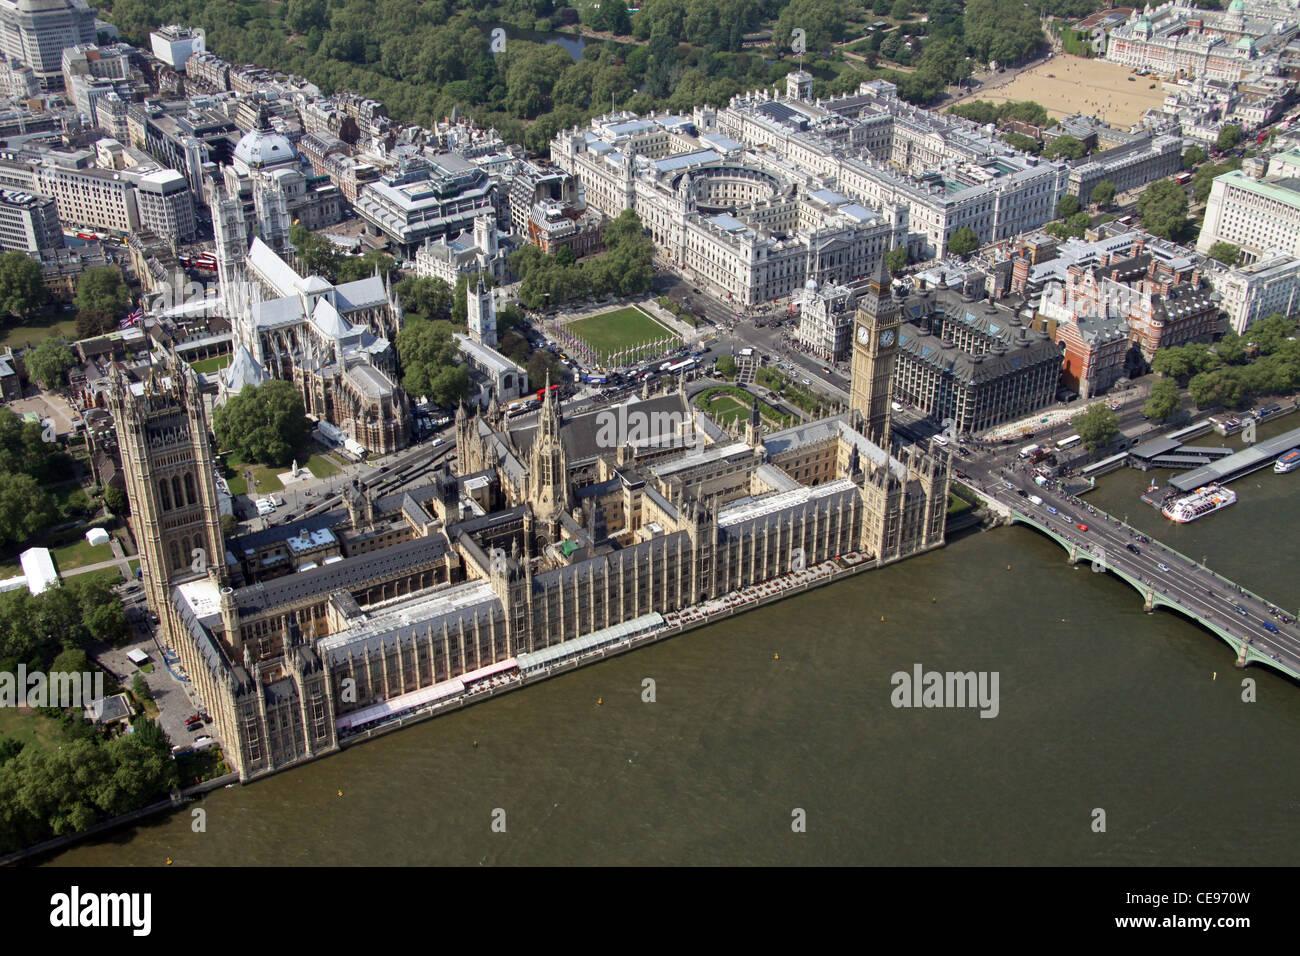 Luftaufnahme von The Houses of Parliament, London SW1 Stockbild